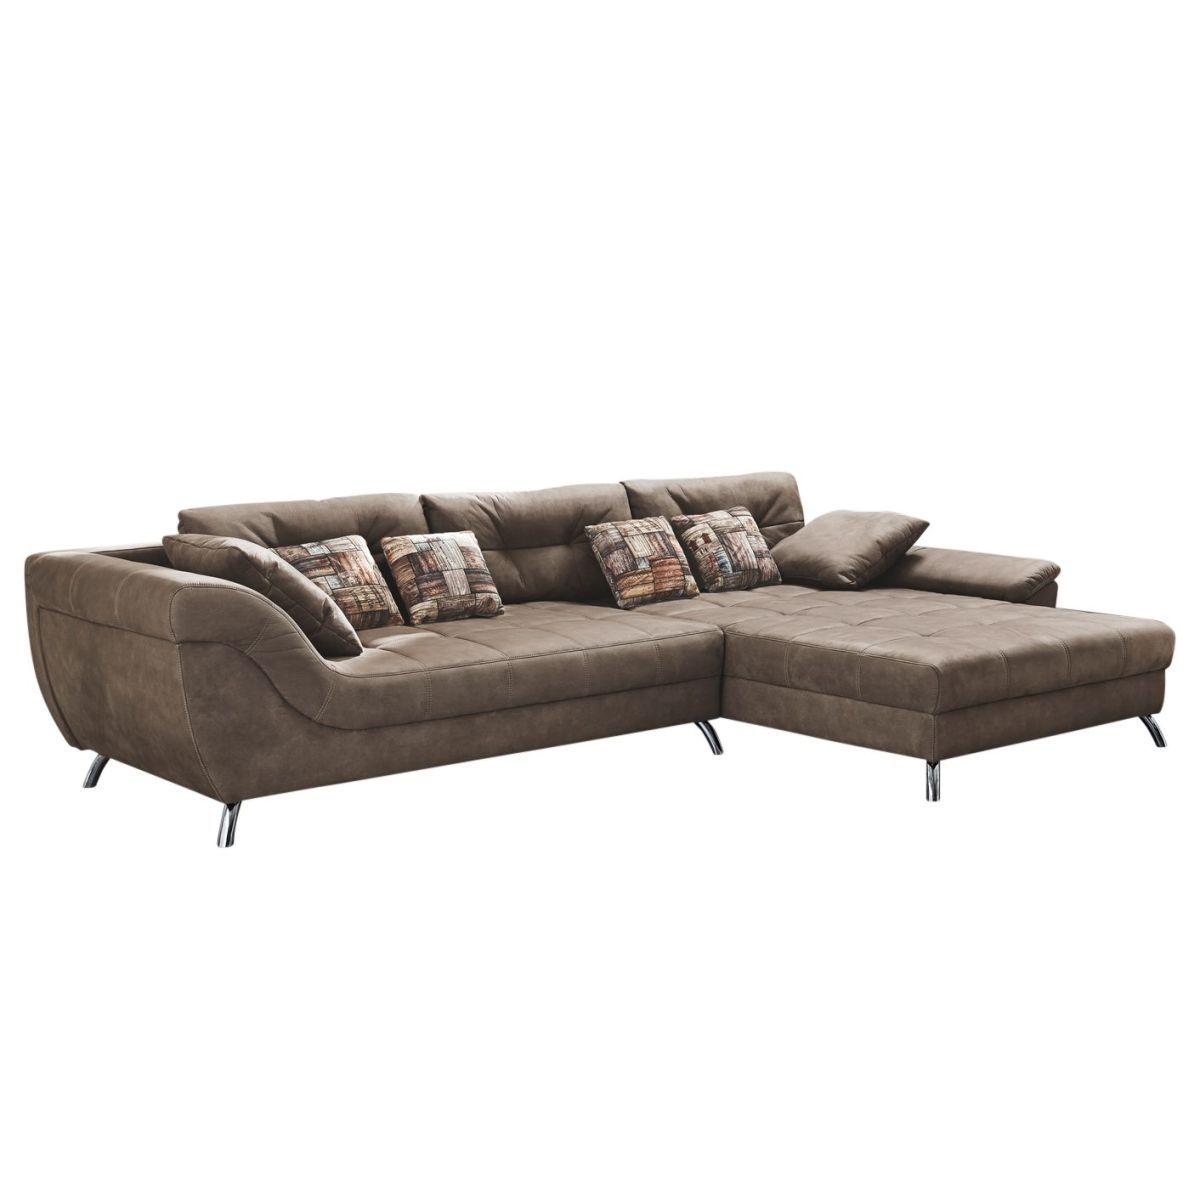 Genial Big Sofa Microfaser Das Beste Von Ecksofa Merizo - - Braun - Longchair